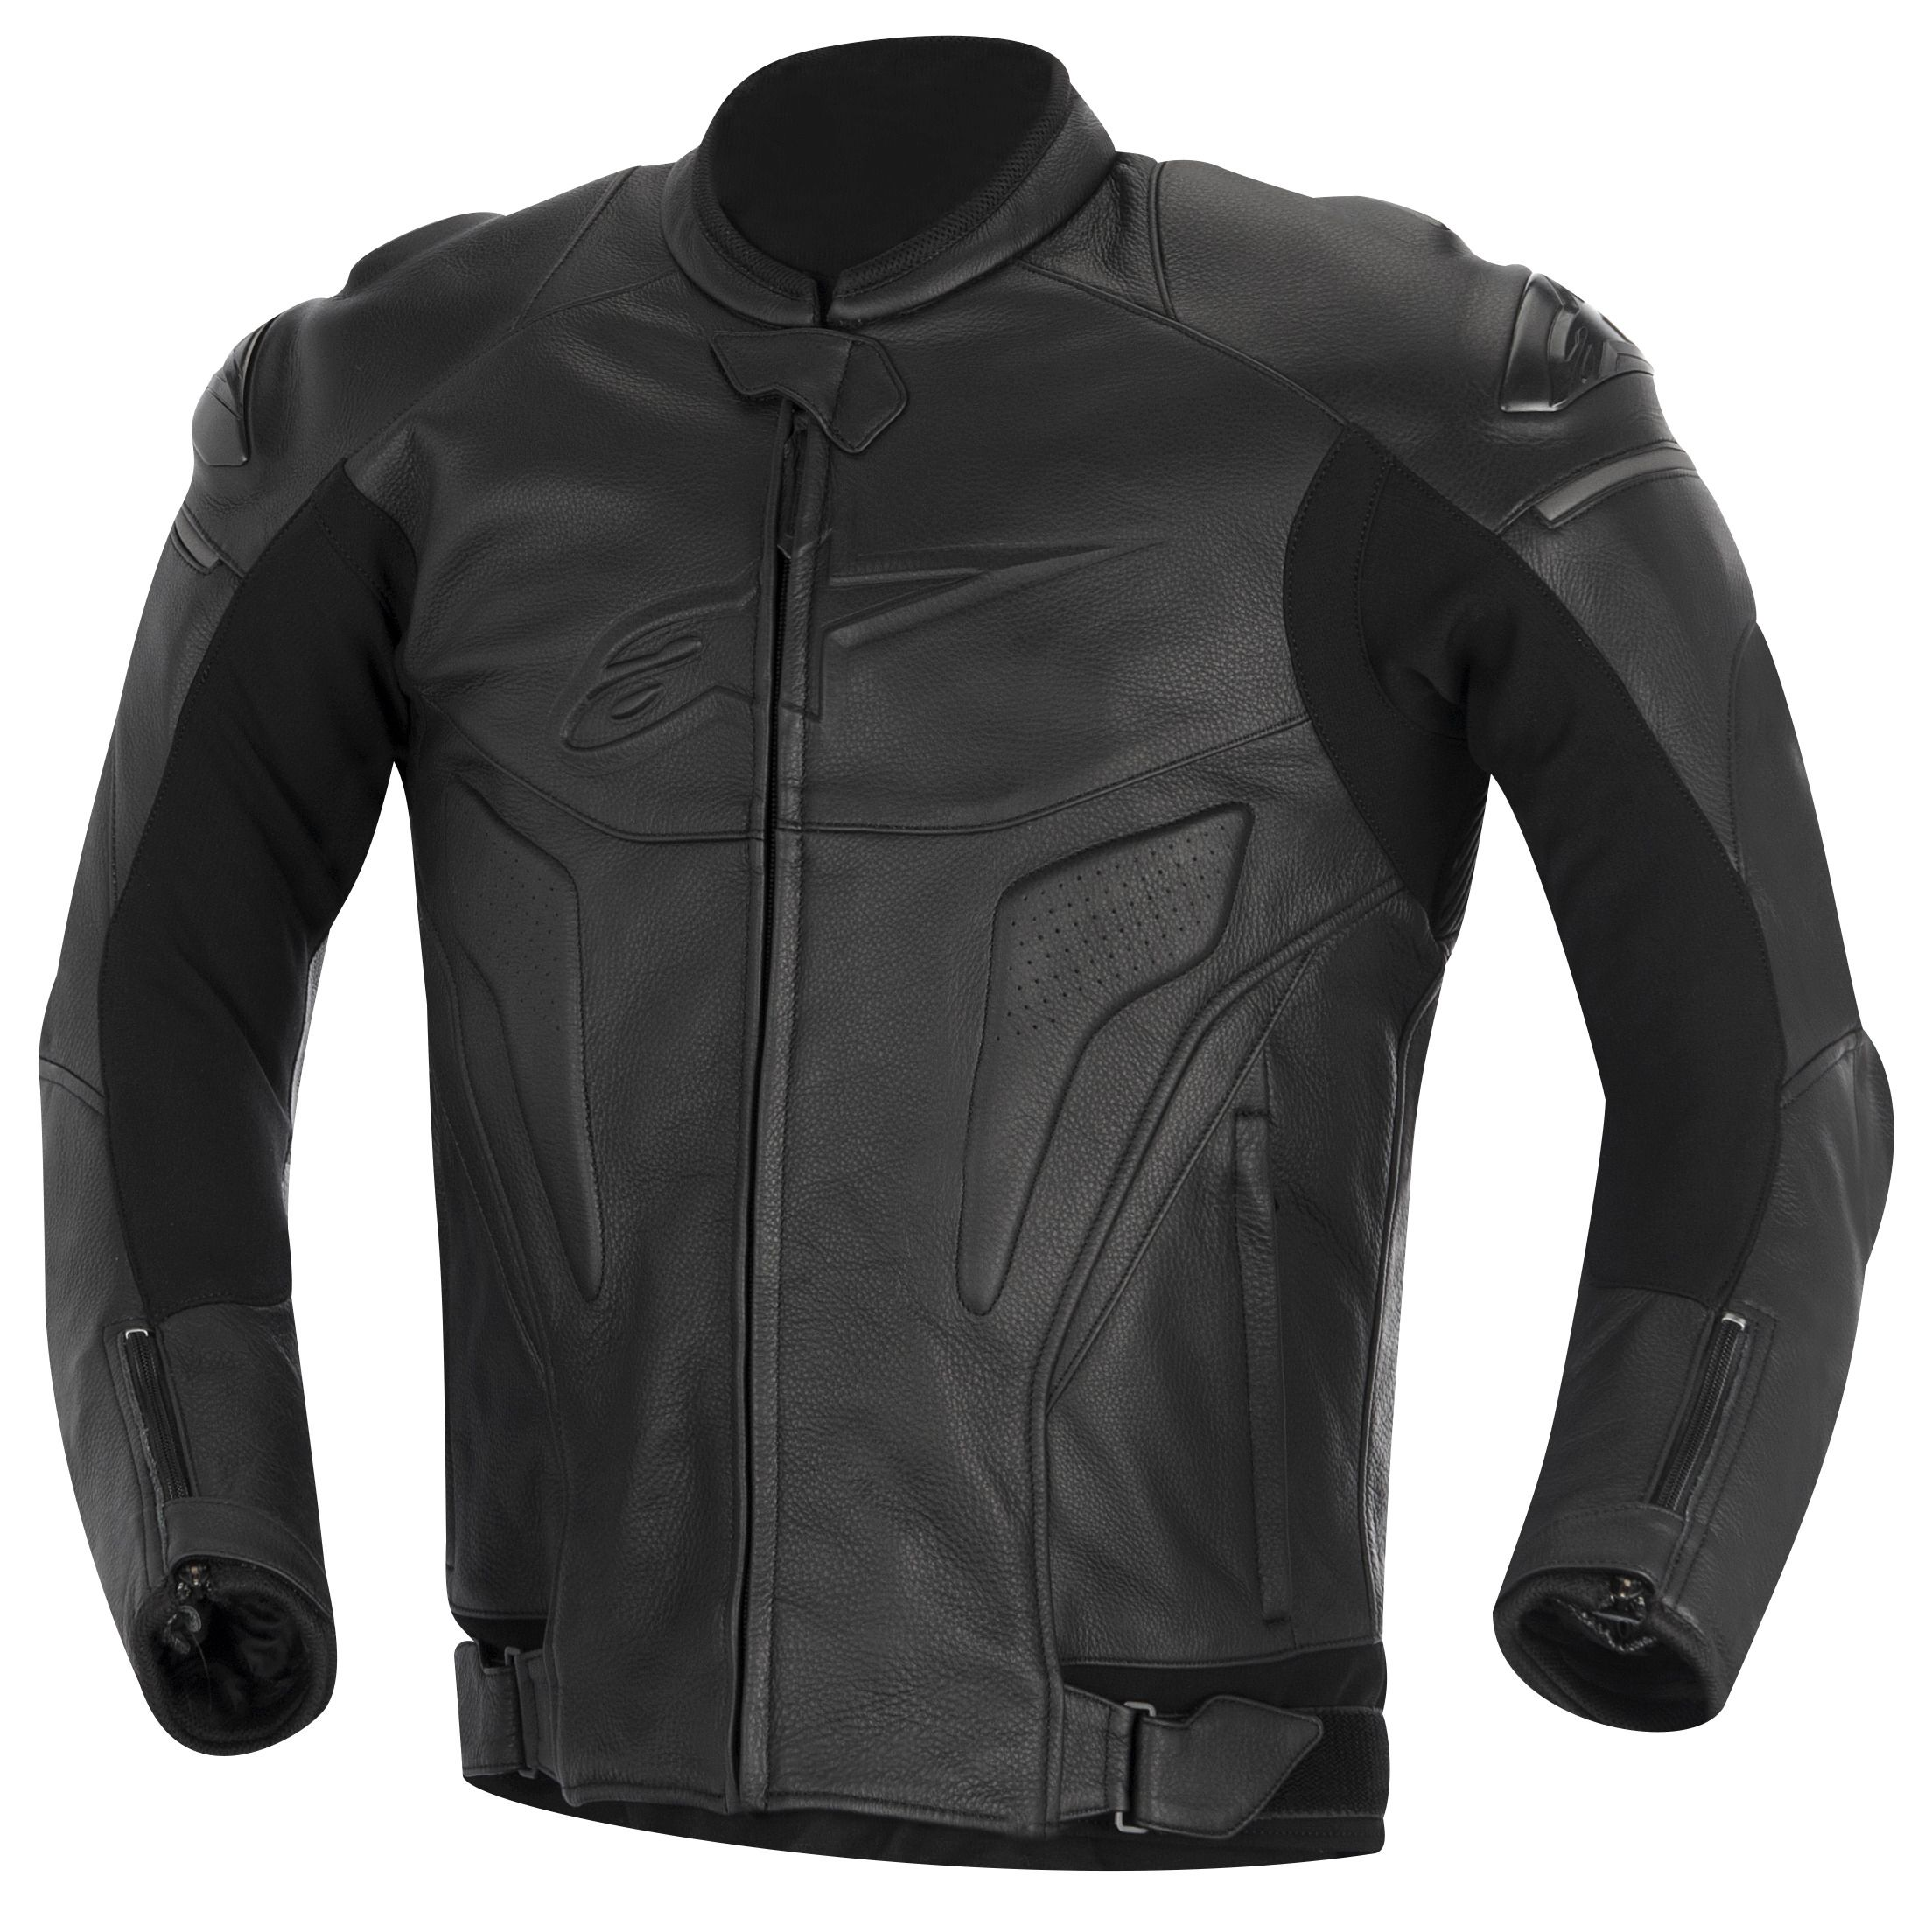 Alpinestars Jacket Leather >> Alpinestars Black Shadow Phantom Jacket - RevZilla